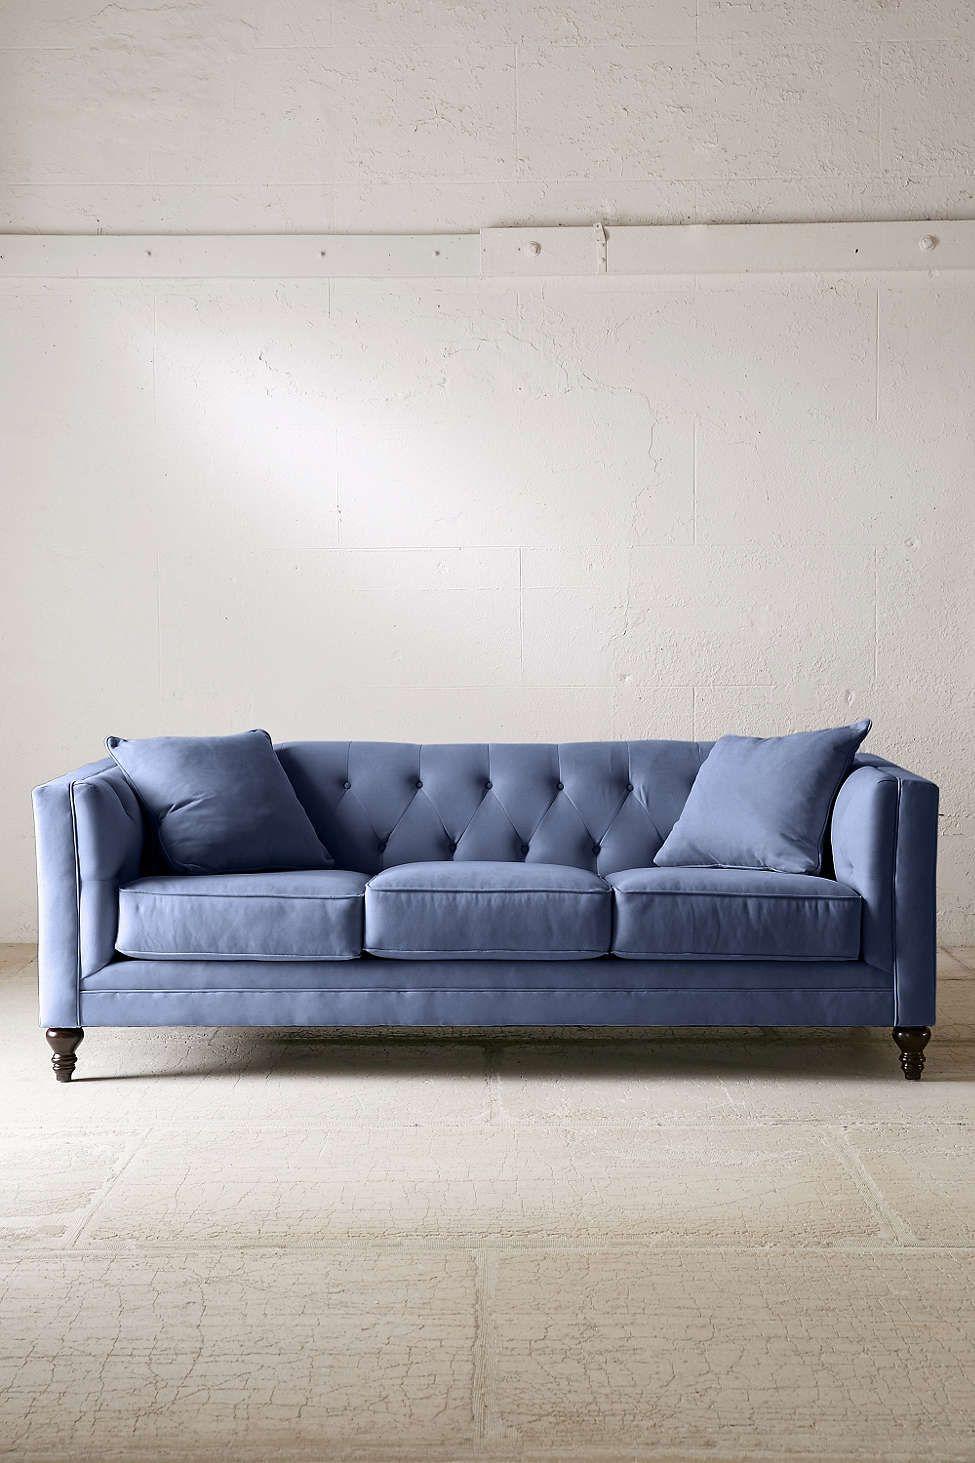 graham microfiber sofa living room inspiration pinterest sofa rh pinterest com